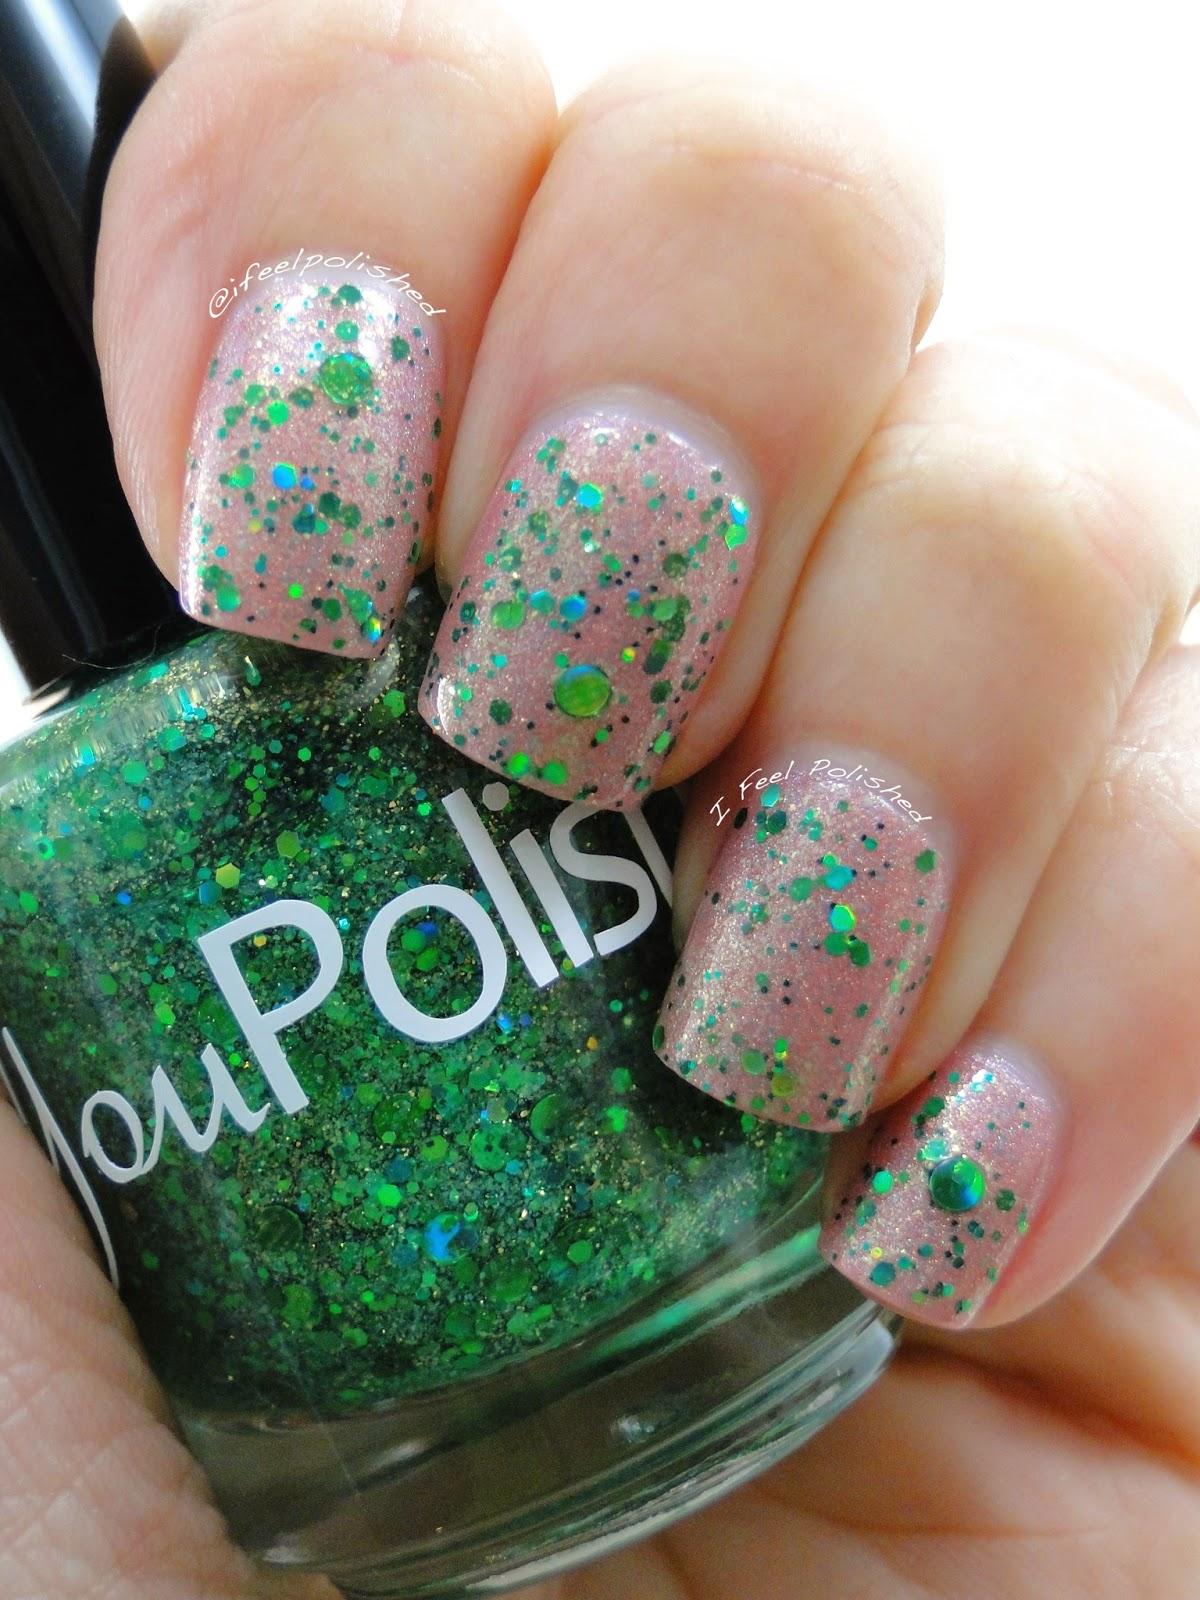 You Polish Emerald Isle